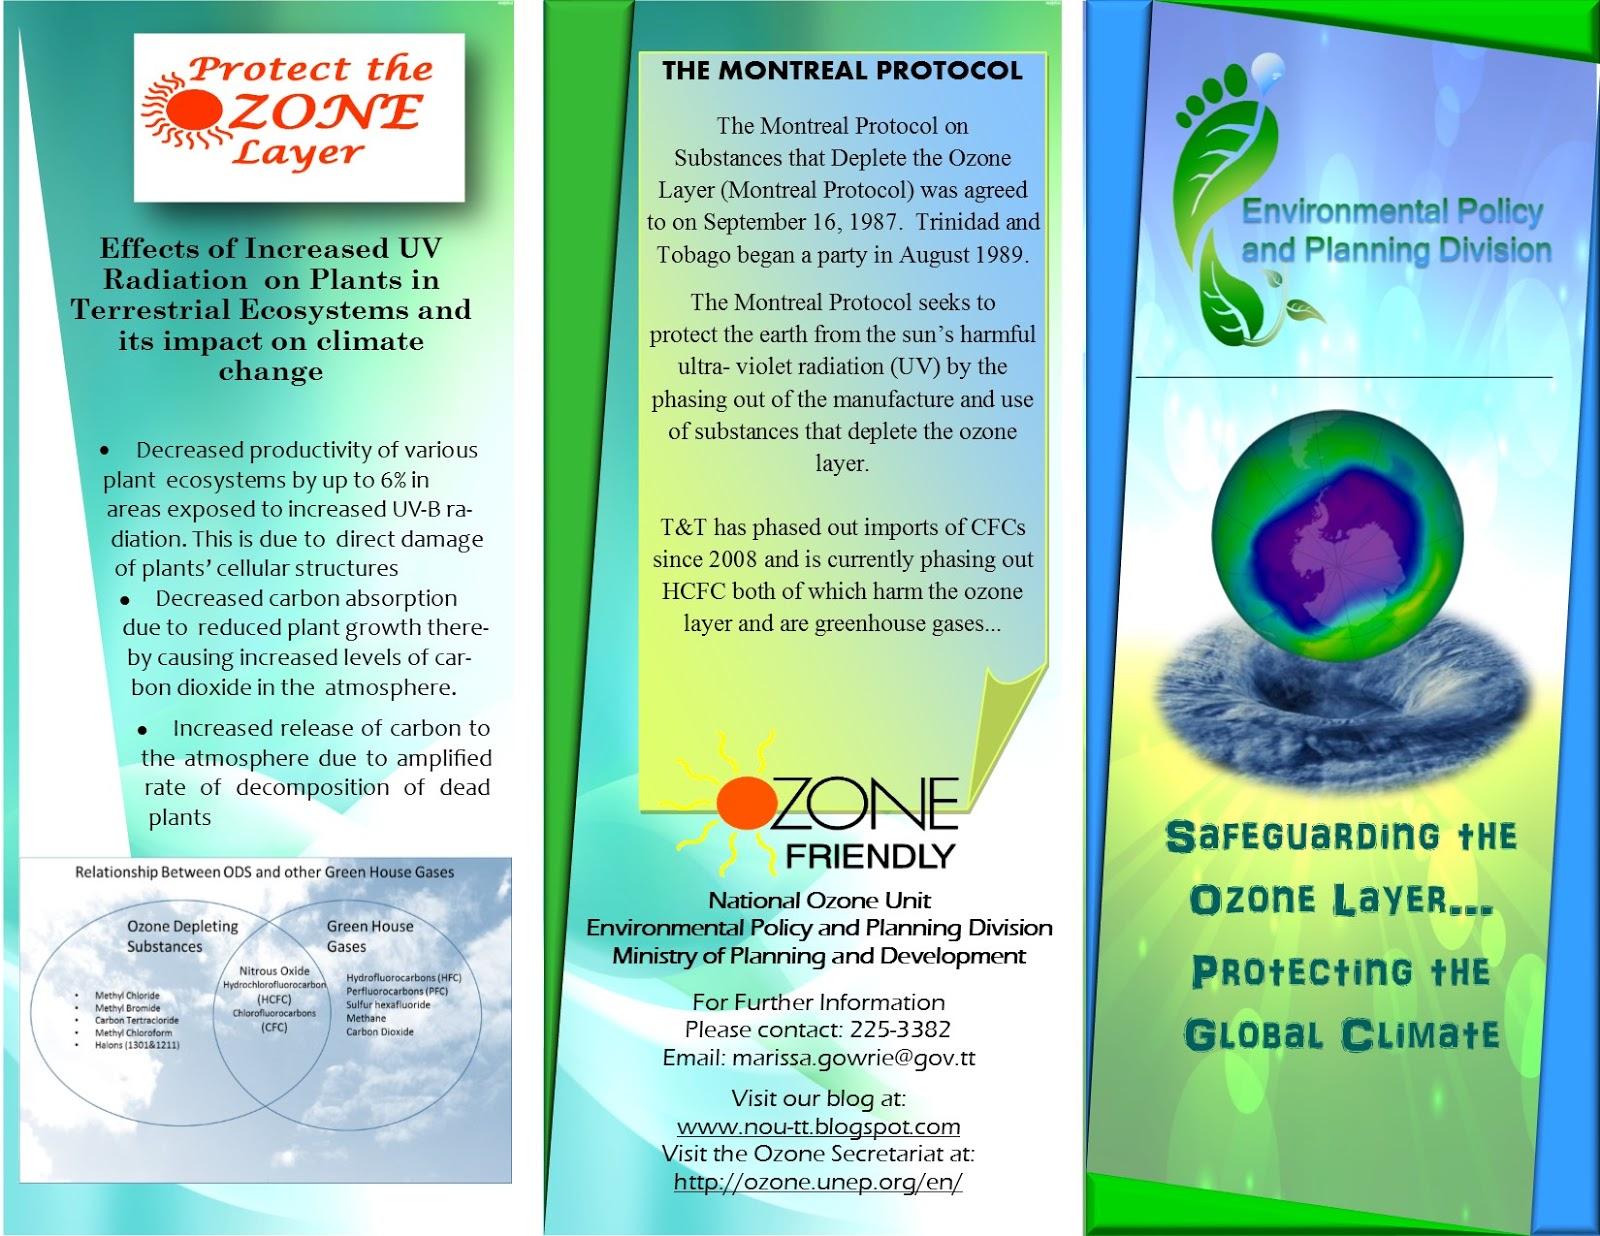 Trinidad And Tobago National Ozone Unit Safeguarding The